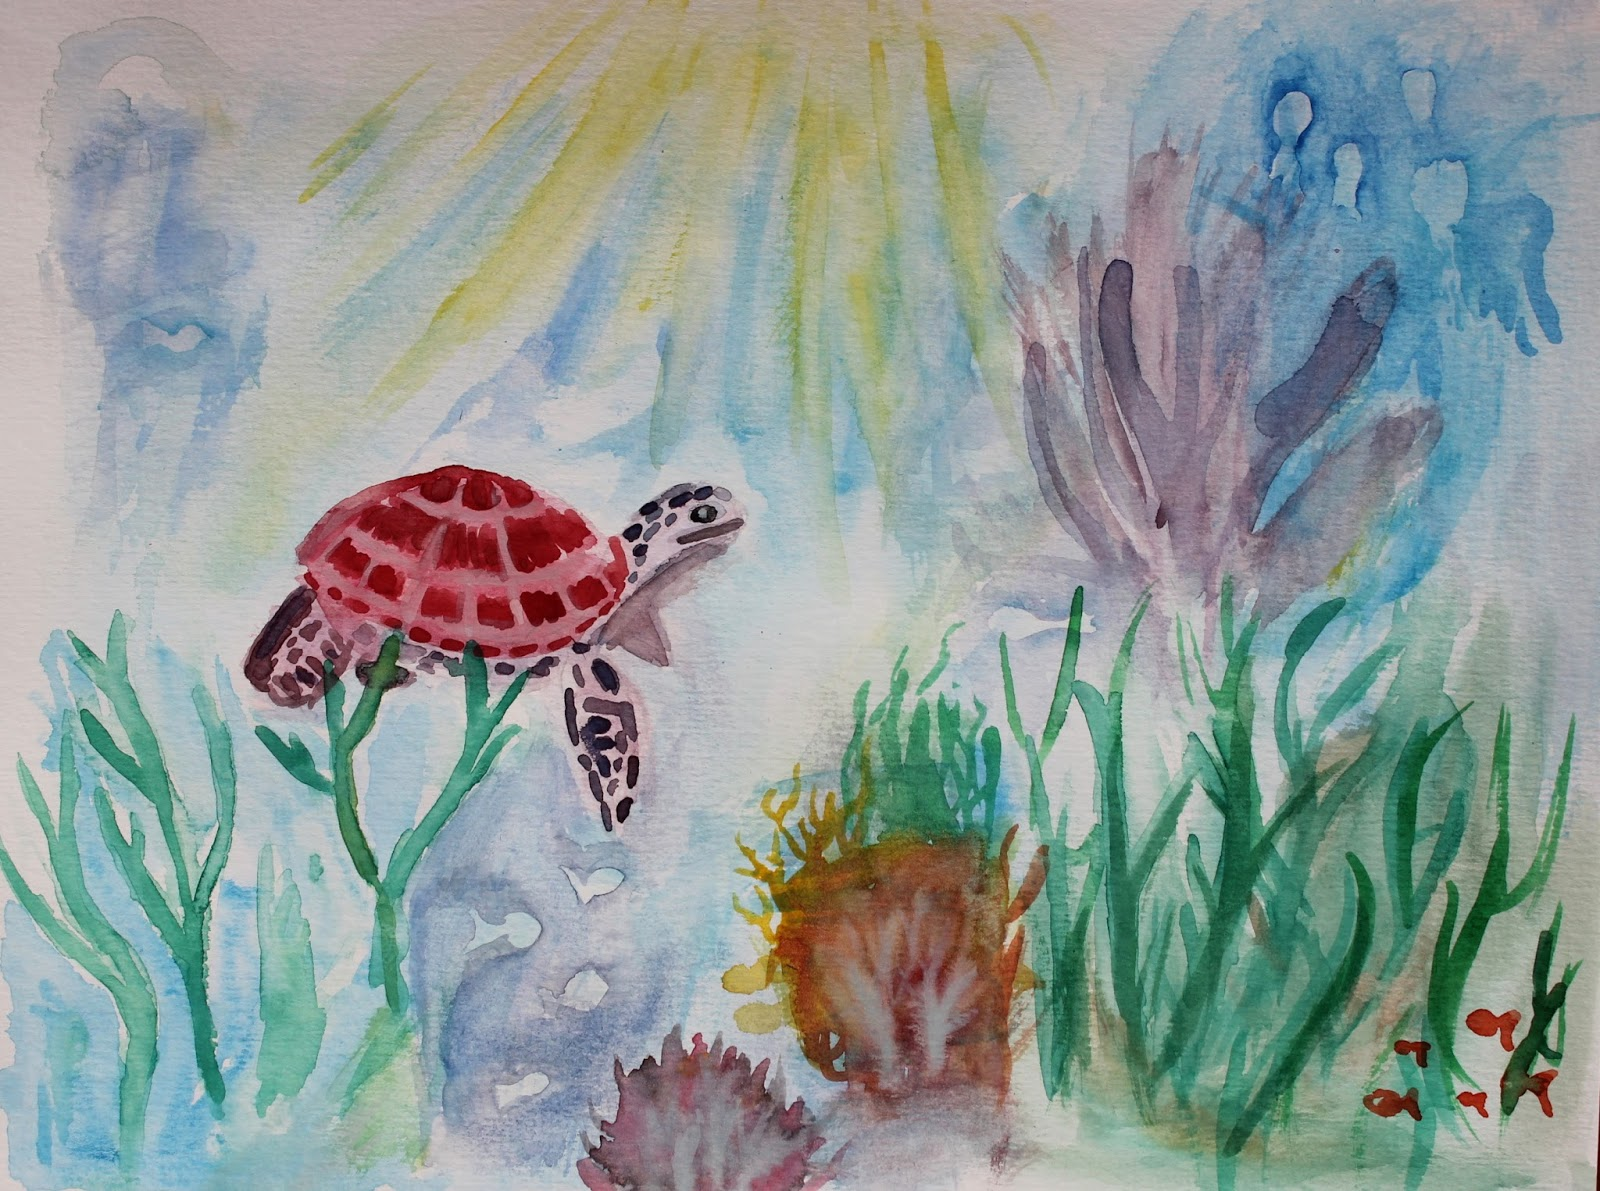 Bekend Aquarel #Schilderen | Senna's Fotoblog &XM58